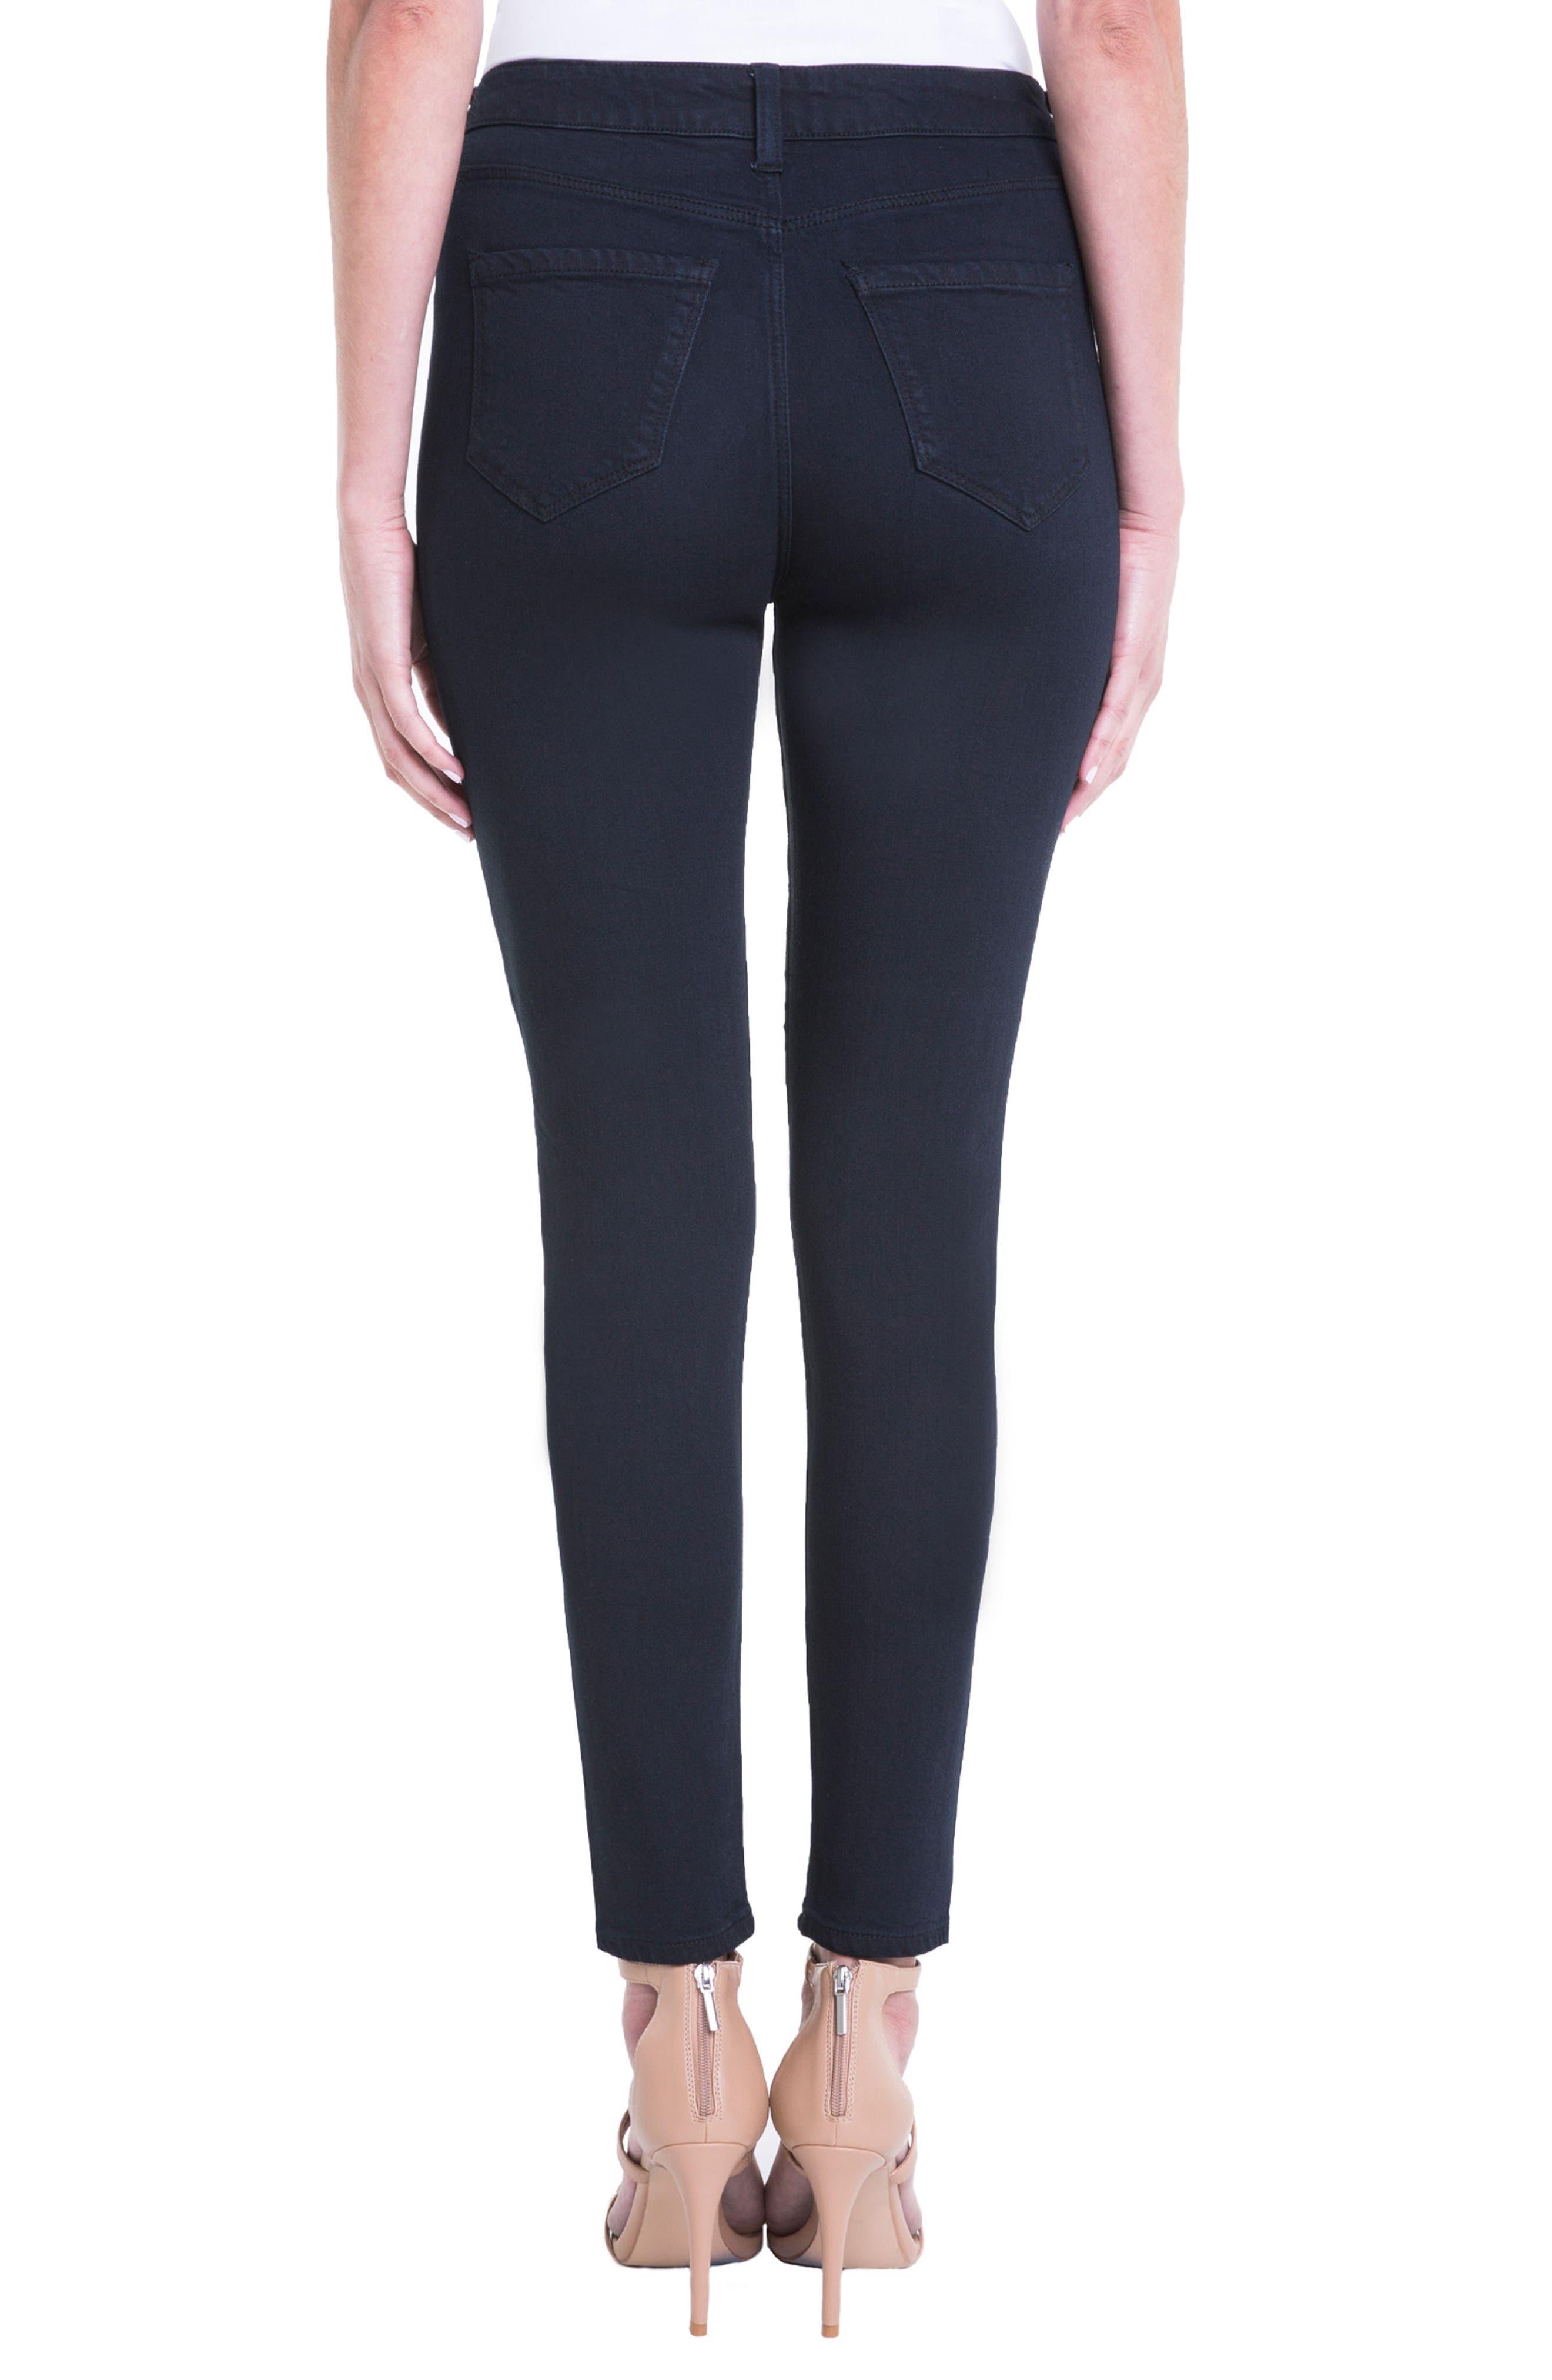 Jeans Company Bridget High Waist Skinny Jeans,                             Alternate thumbnail 2, color,                             Indigo Over Dye Black